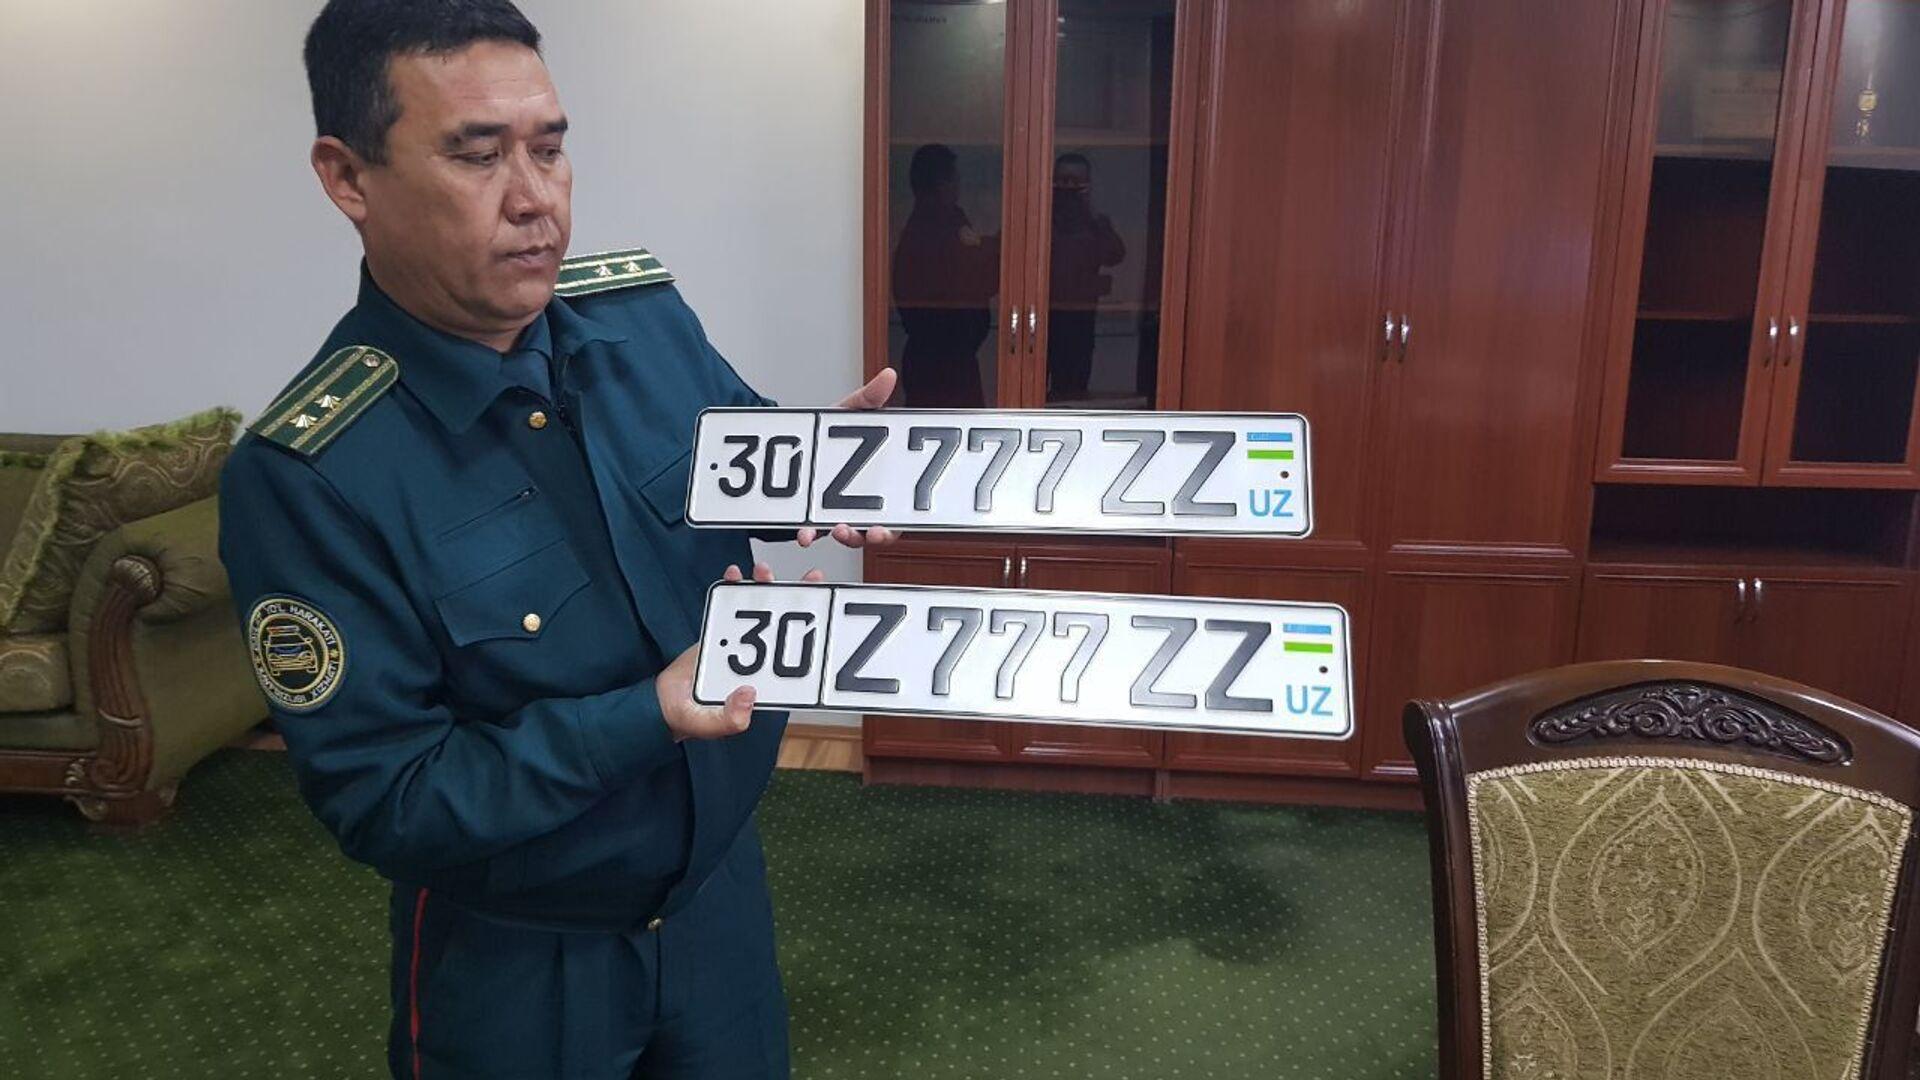 Rekordnaya tsena: v Samarkande na auktsione prodali avtonomer za $57 tыsyach - Sputnik Oʻzbekiston, 1920, 13.10.2021